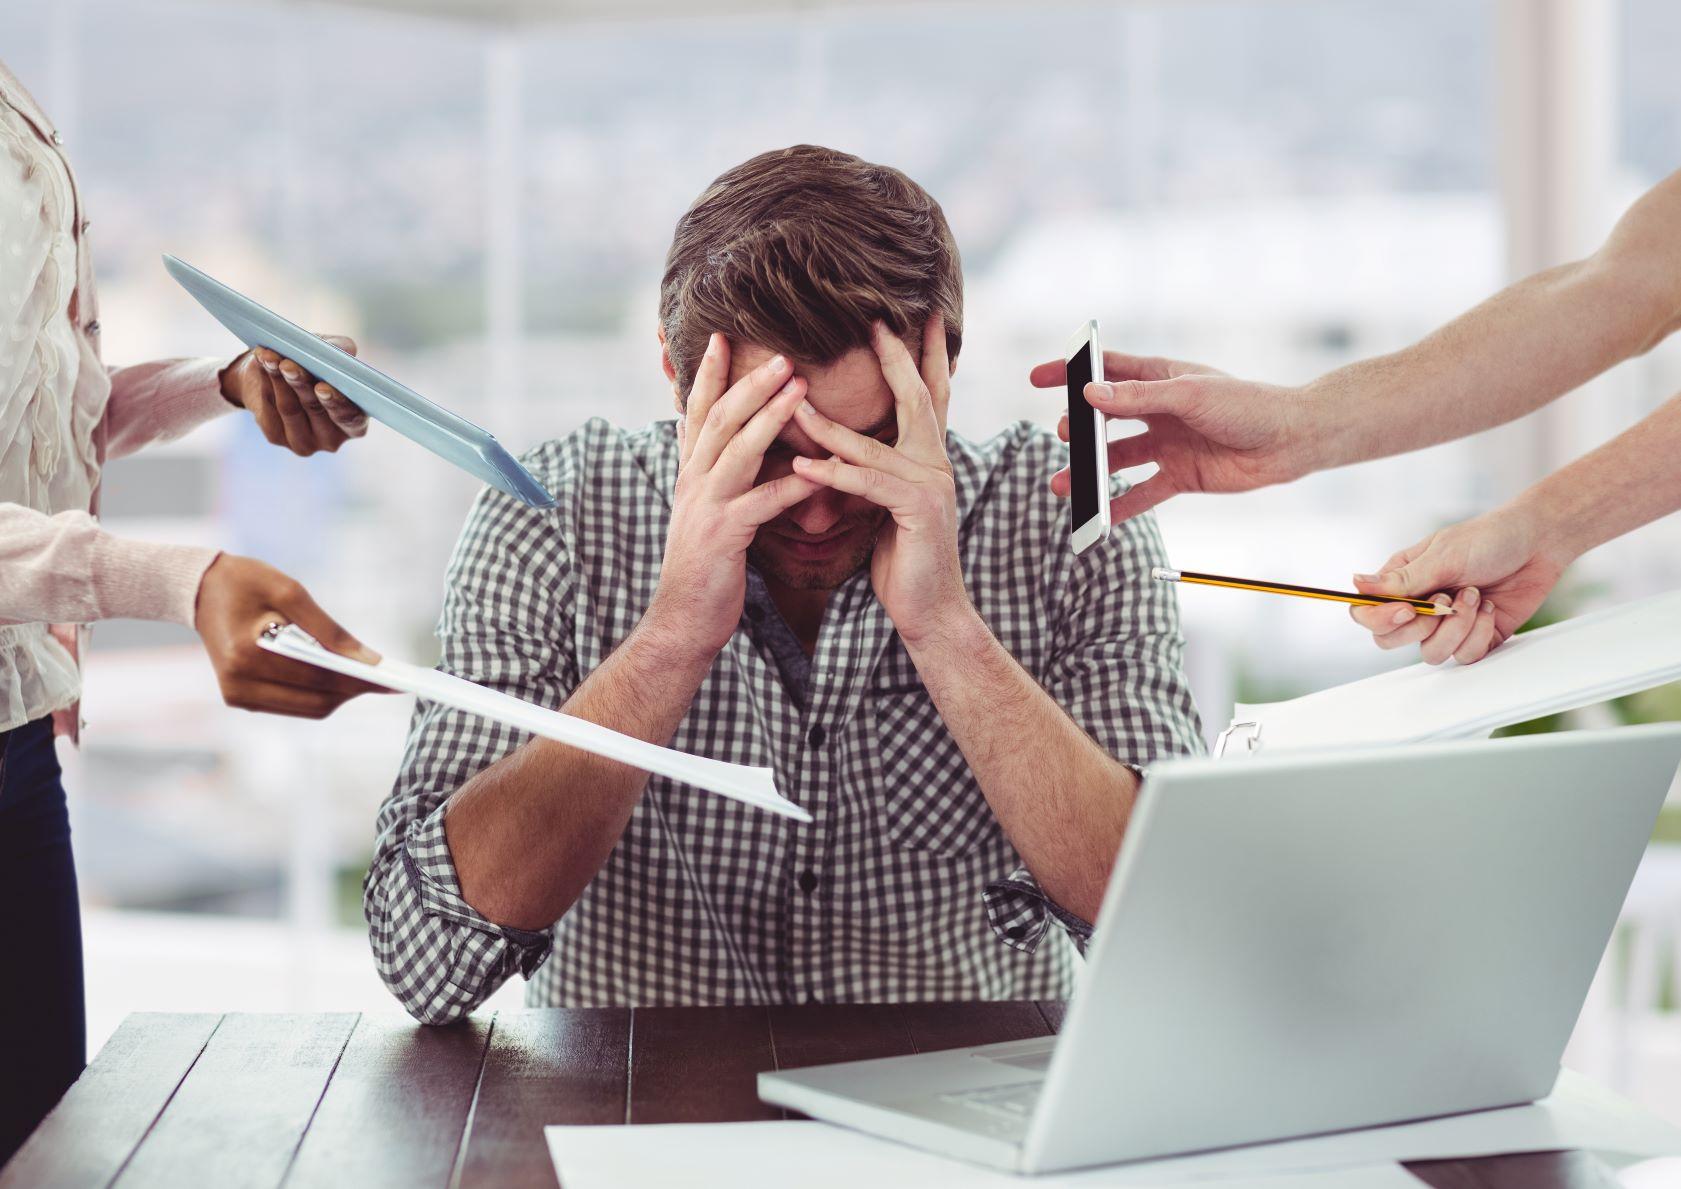 Ako telo reaguje na stres? | Istres.sk